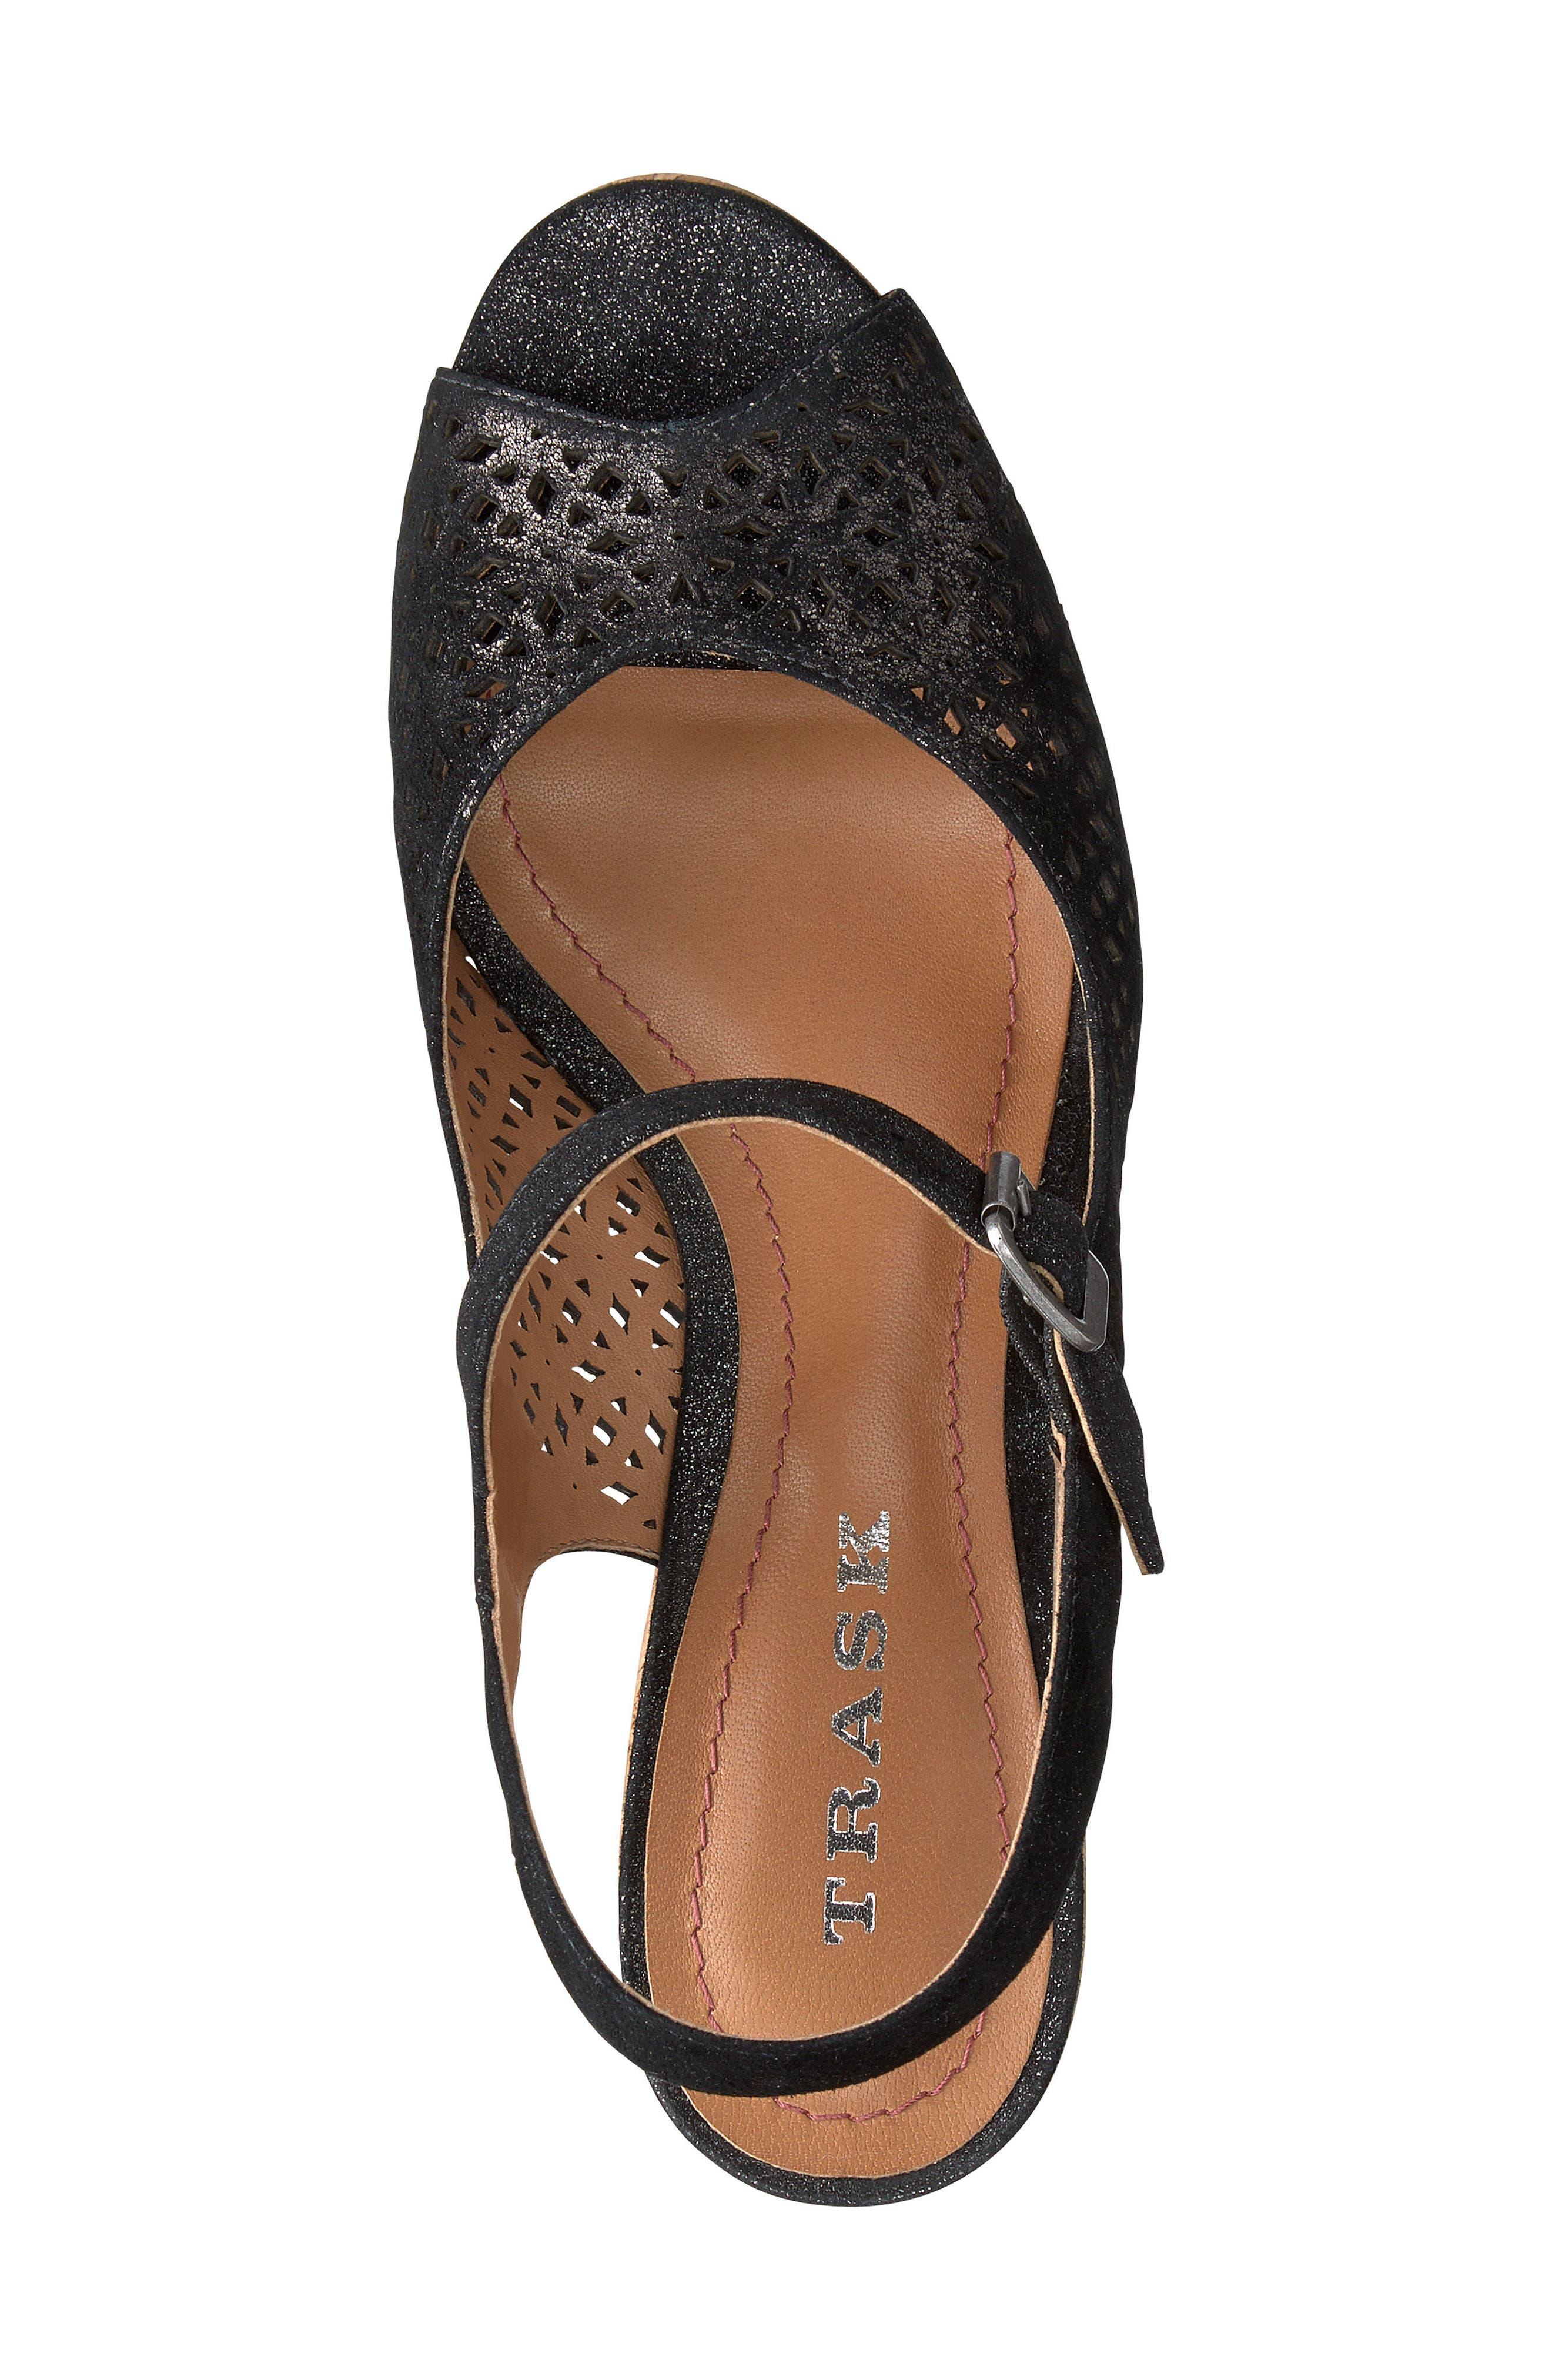 Pattie Wedge Sandal,                             Alternate thumbnail 5, color,                             BLACK METALLIC SUEDE